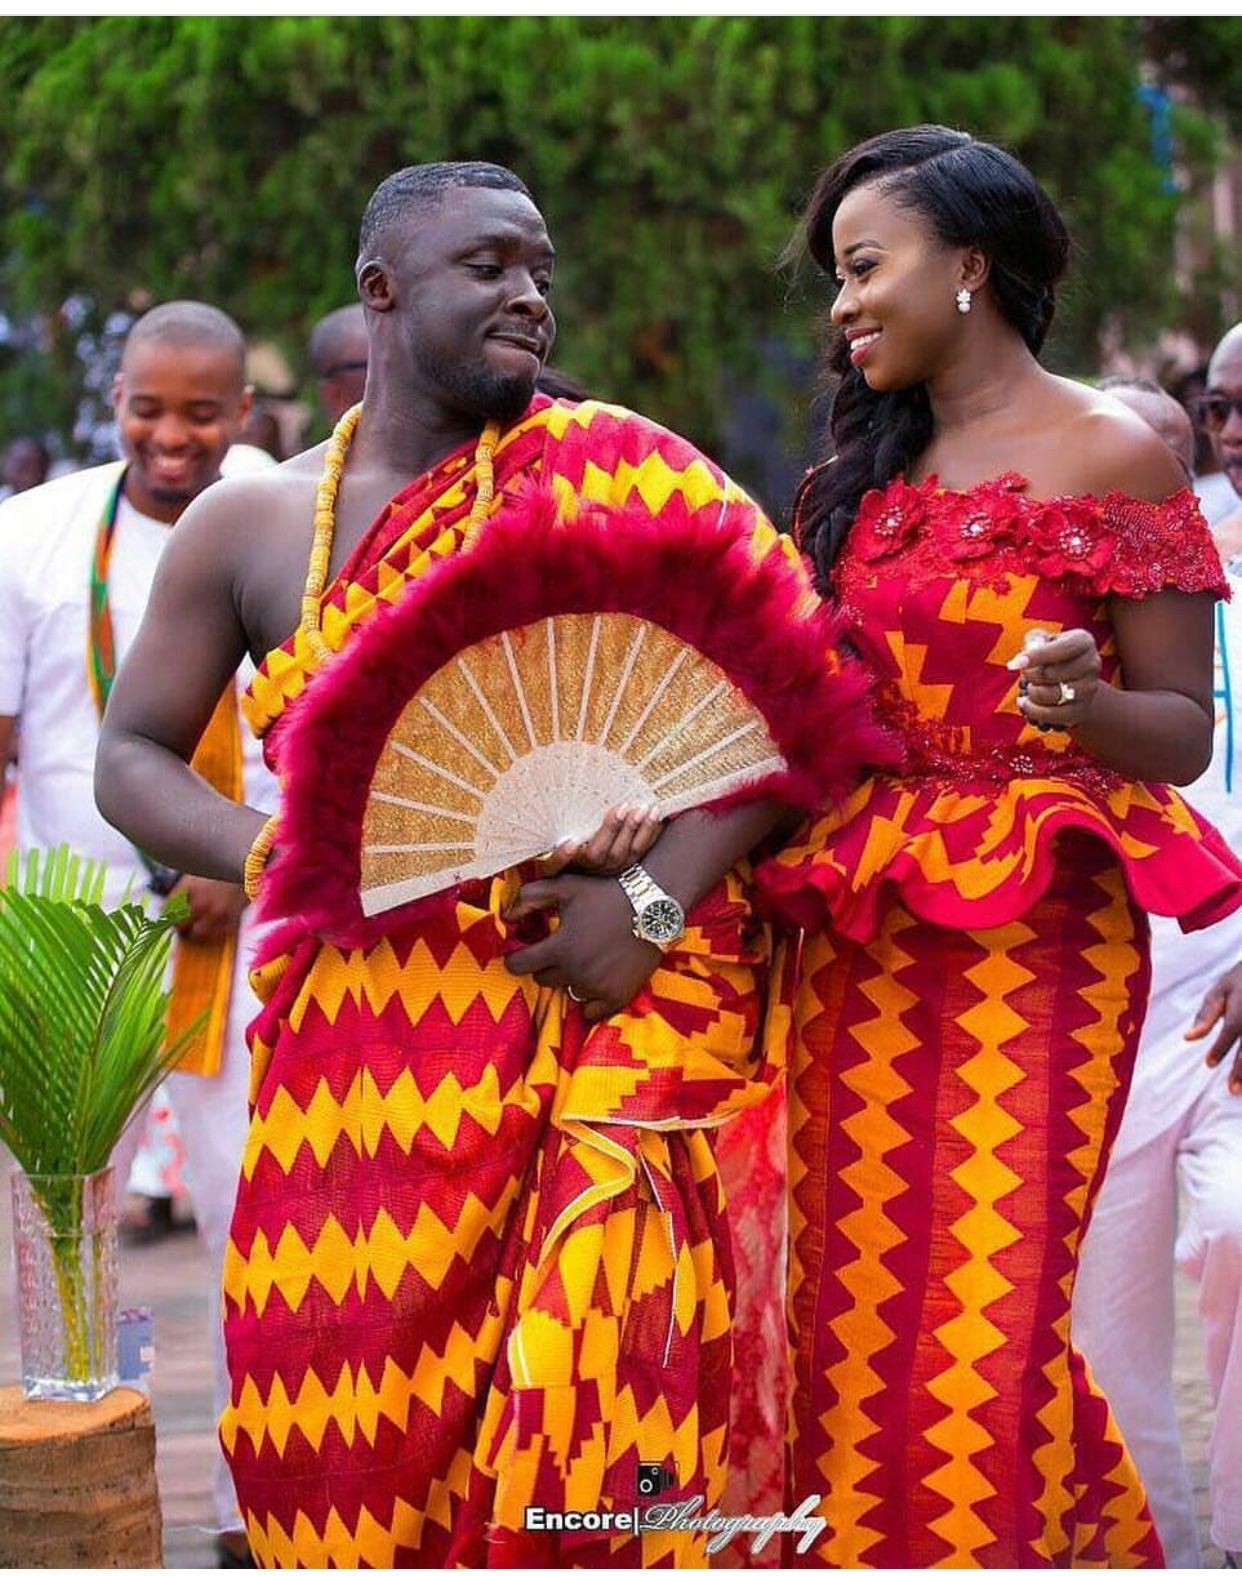 Wedding Engagement Styles Kente Dress Kente Styles Ghana Traditional Wedding